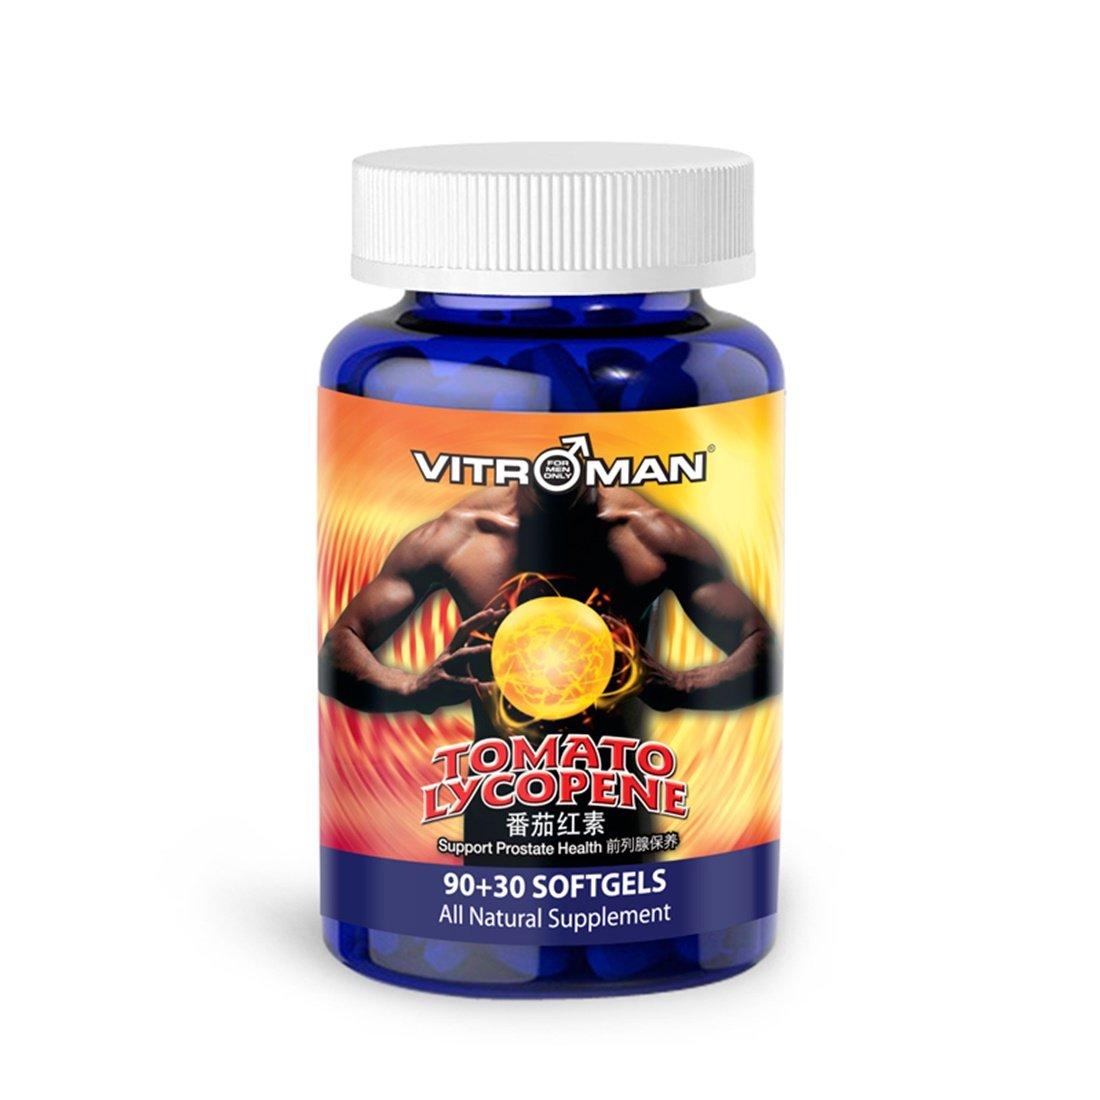 VITROMAN Tomato Lycopene (120 softgels), Cardiovascular Support, Premium Quality Antioxidant - 100% Natural Tomato - Great For Prostate Health Immune System Support Eyesight Support Health Supplement